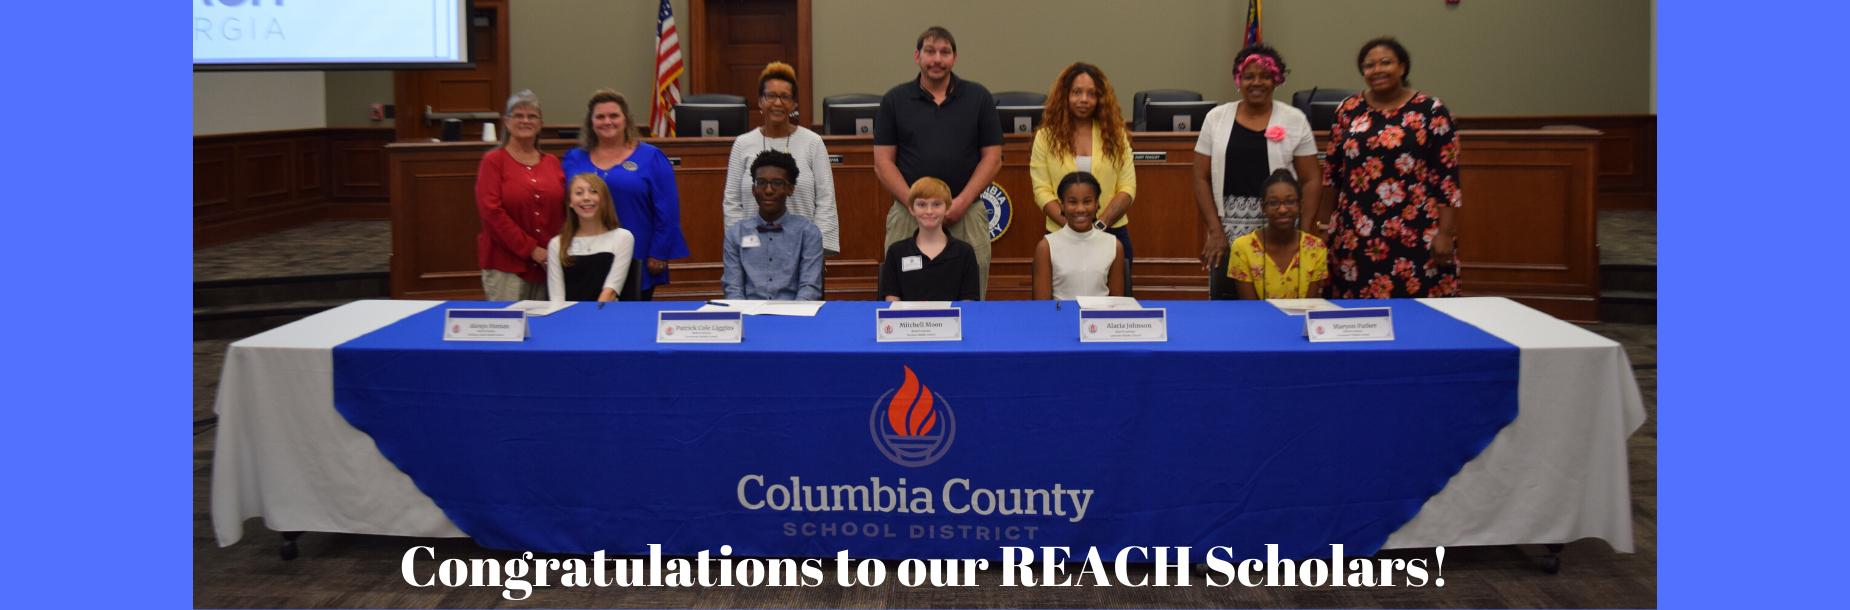 Columbia County School District for Columbia County Ga Calendar